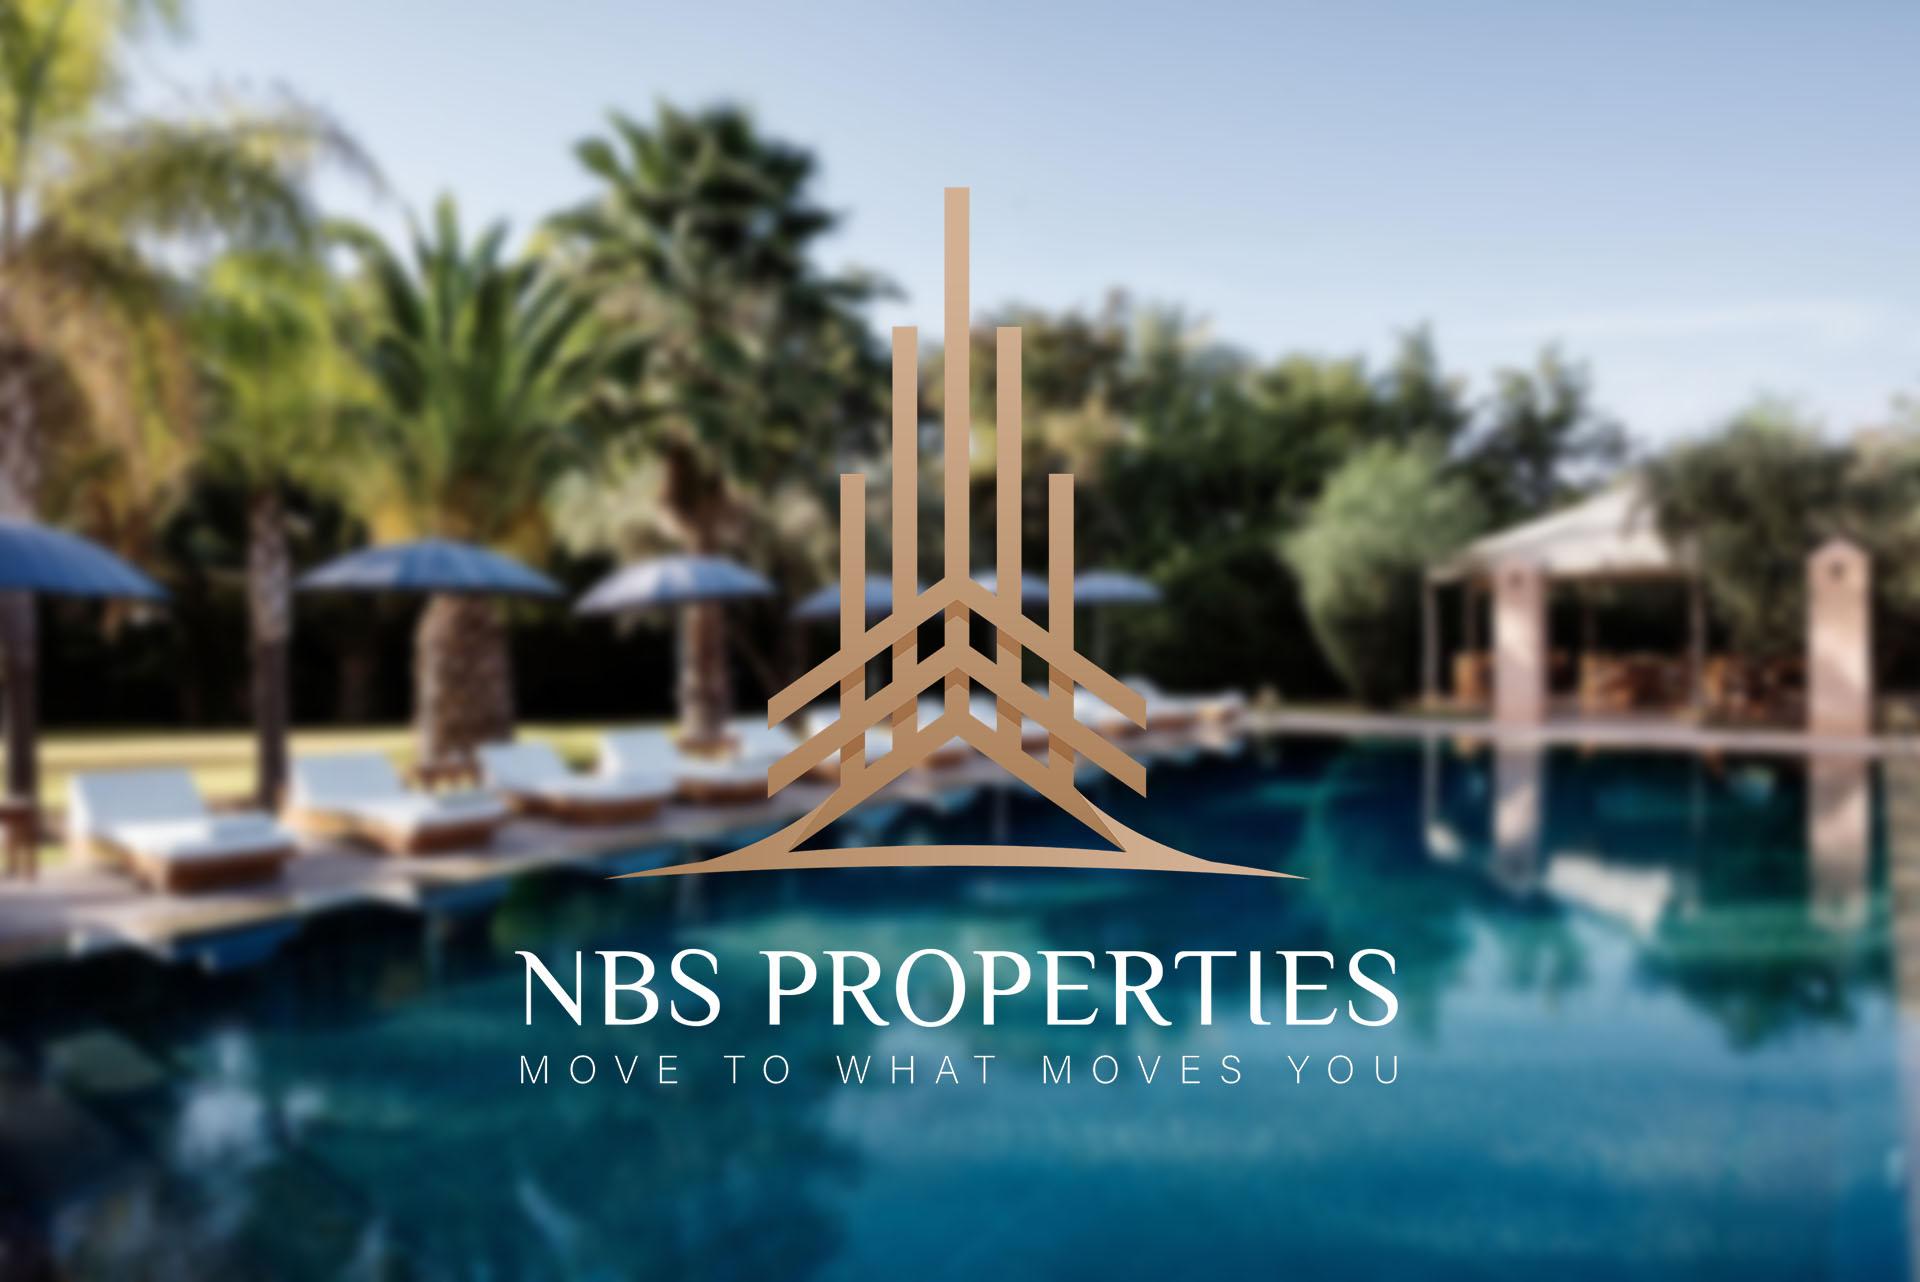 NBS properties